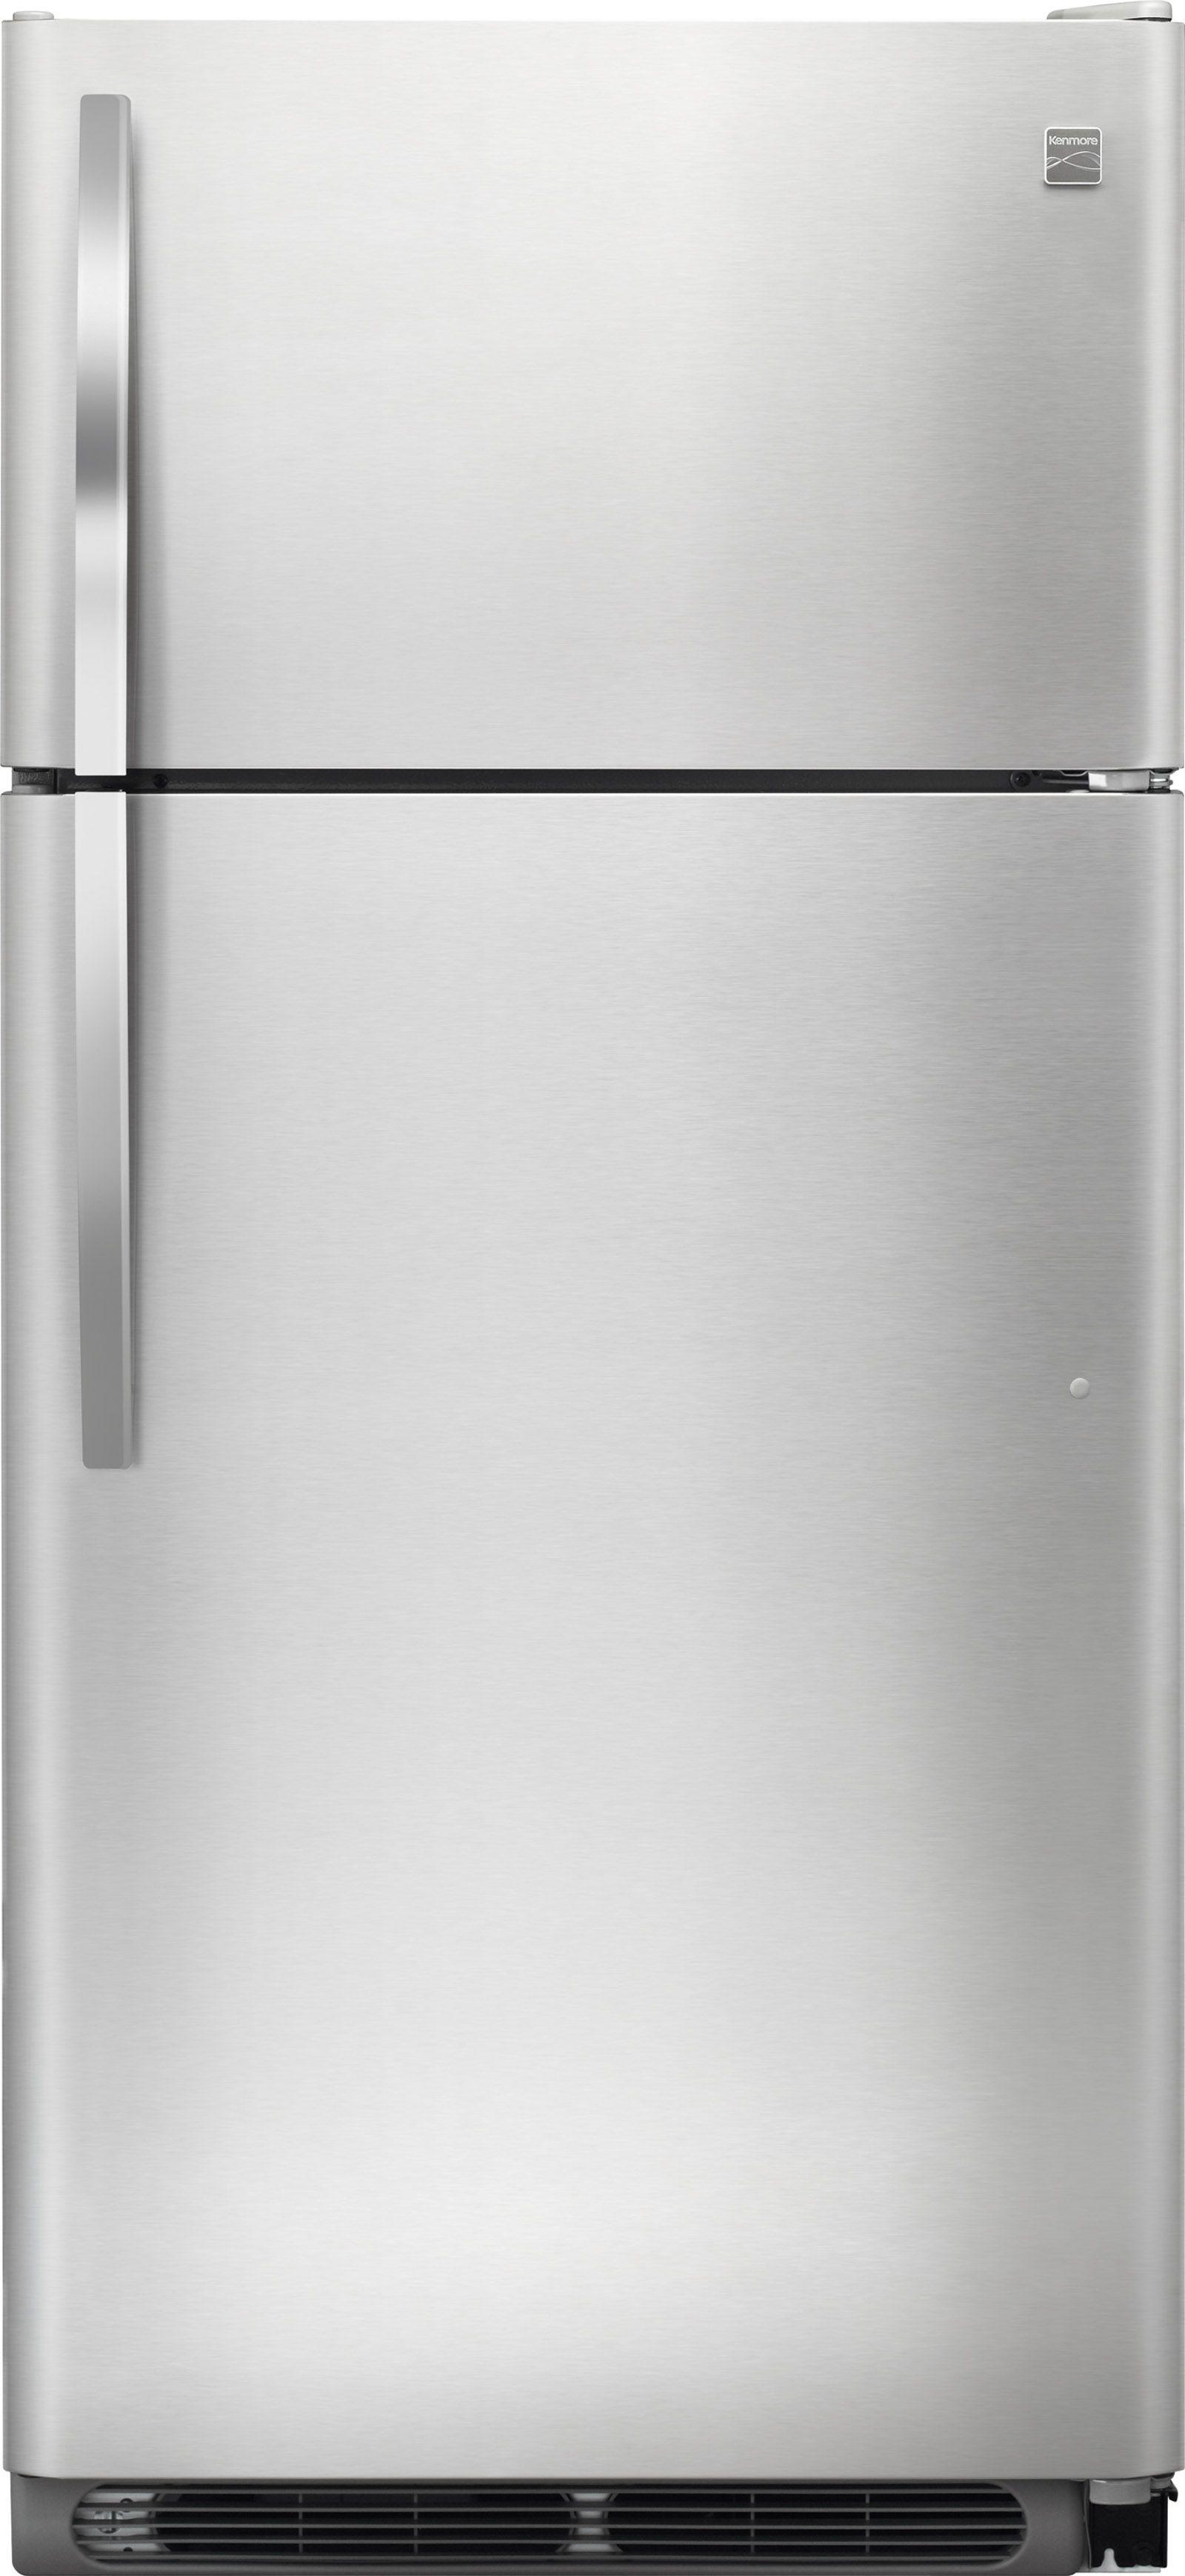 Kenmore 60505 18 cu. ft. Top Freezer Refrigerator w/ Glass ...